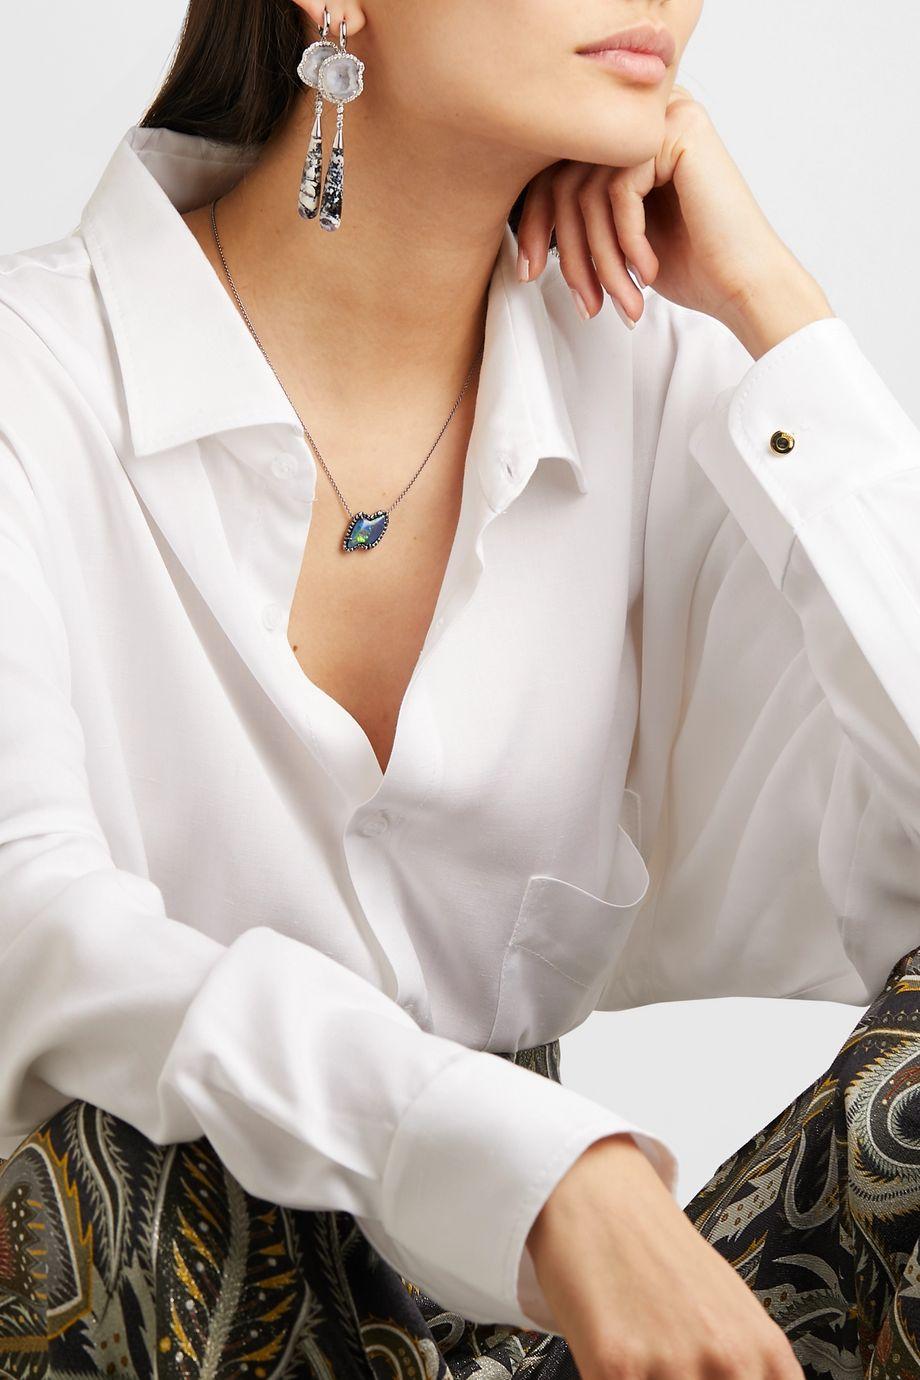 Kimberly McDonald + NET SUSTAIN 18-karat blackened white gold, opal and diamond necklace